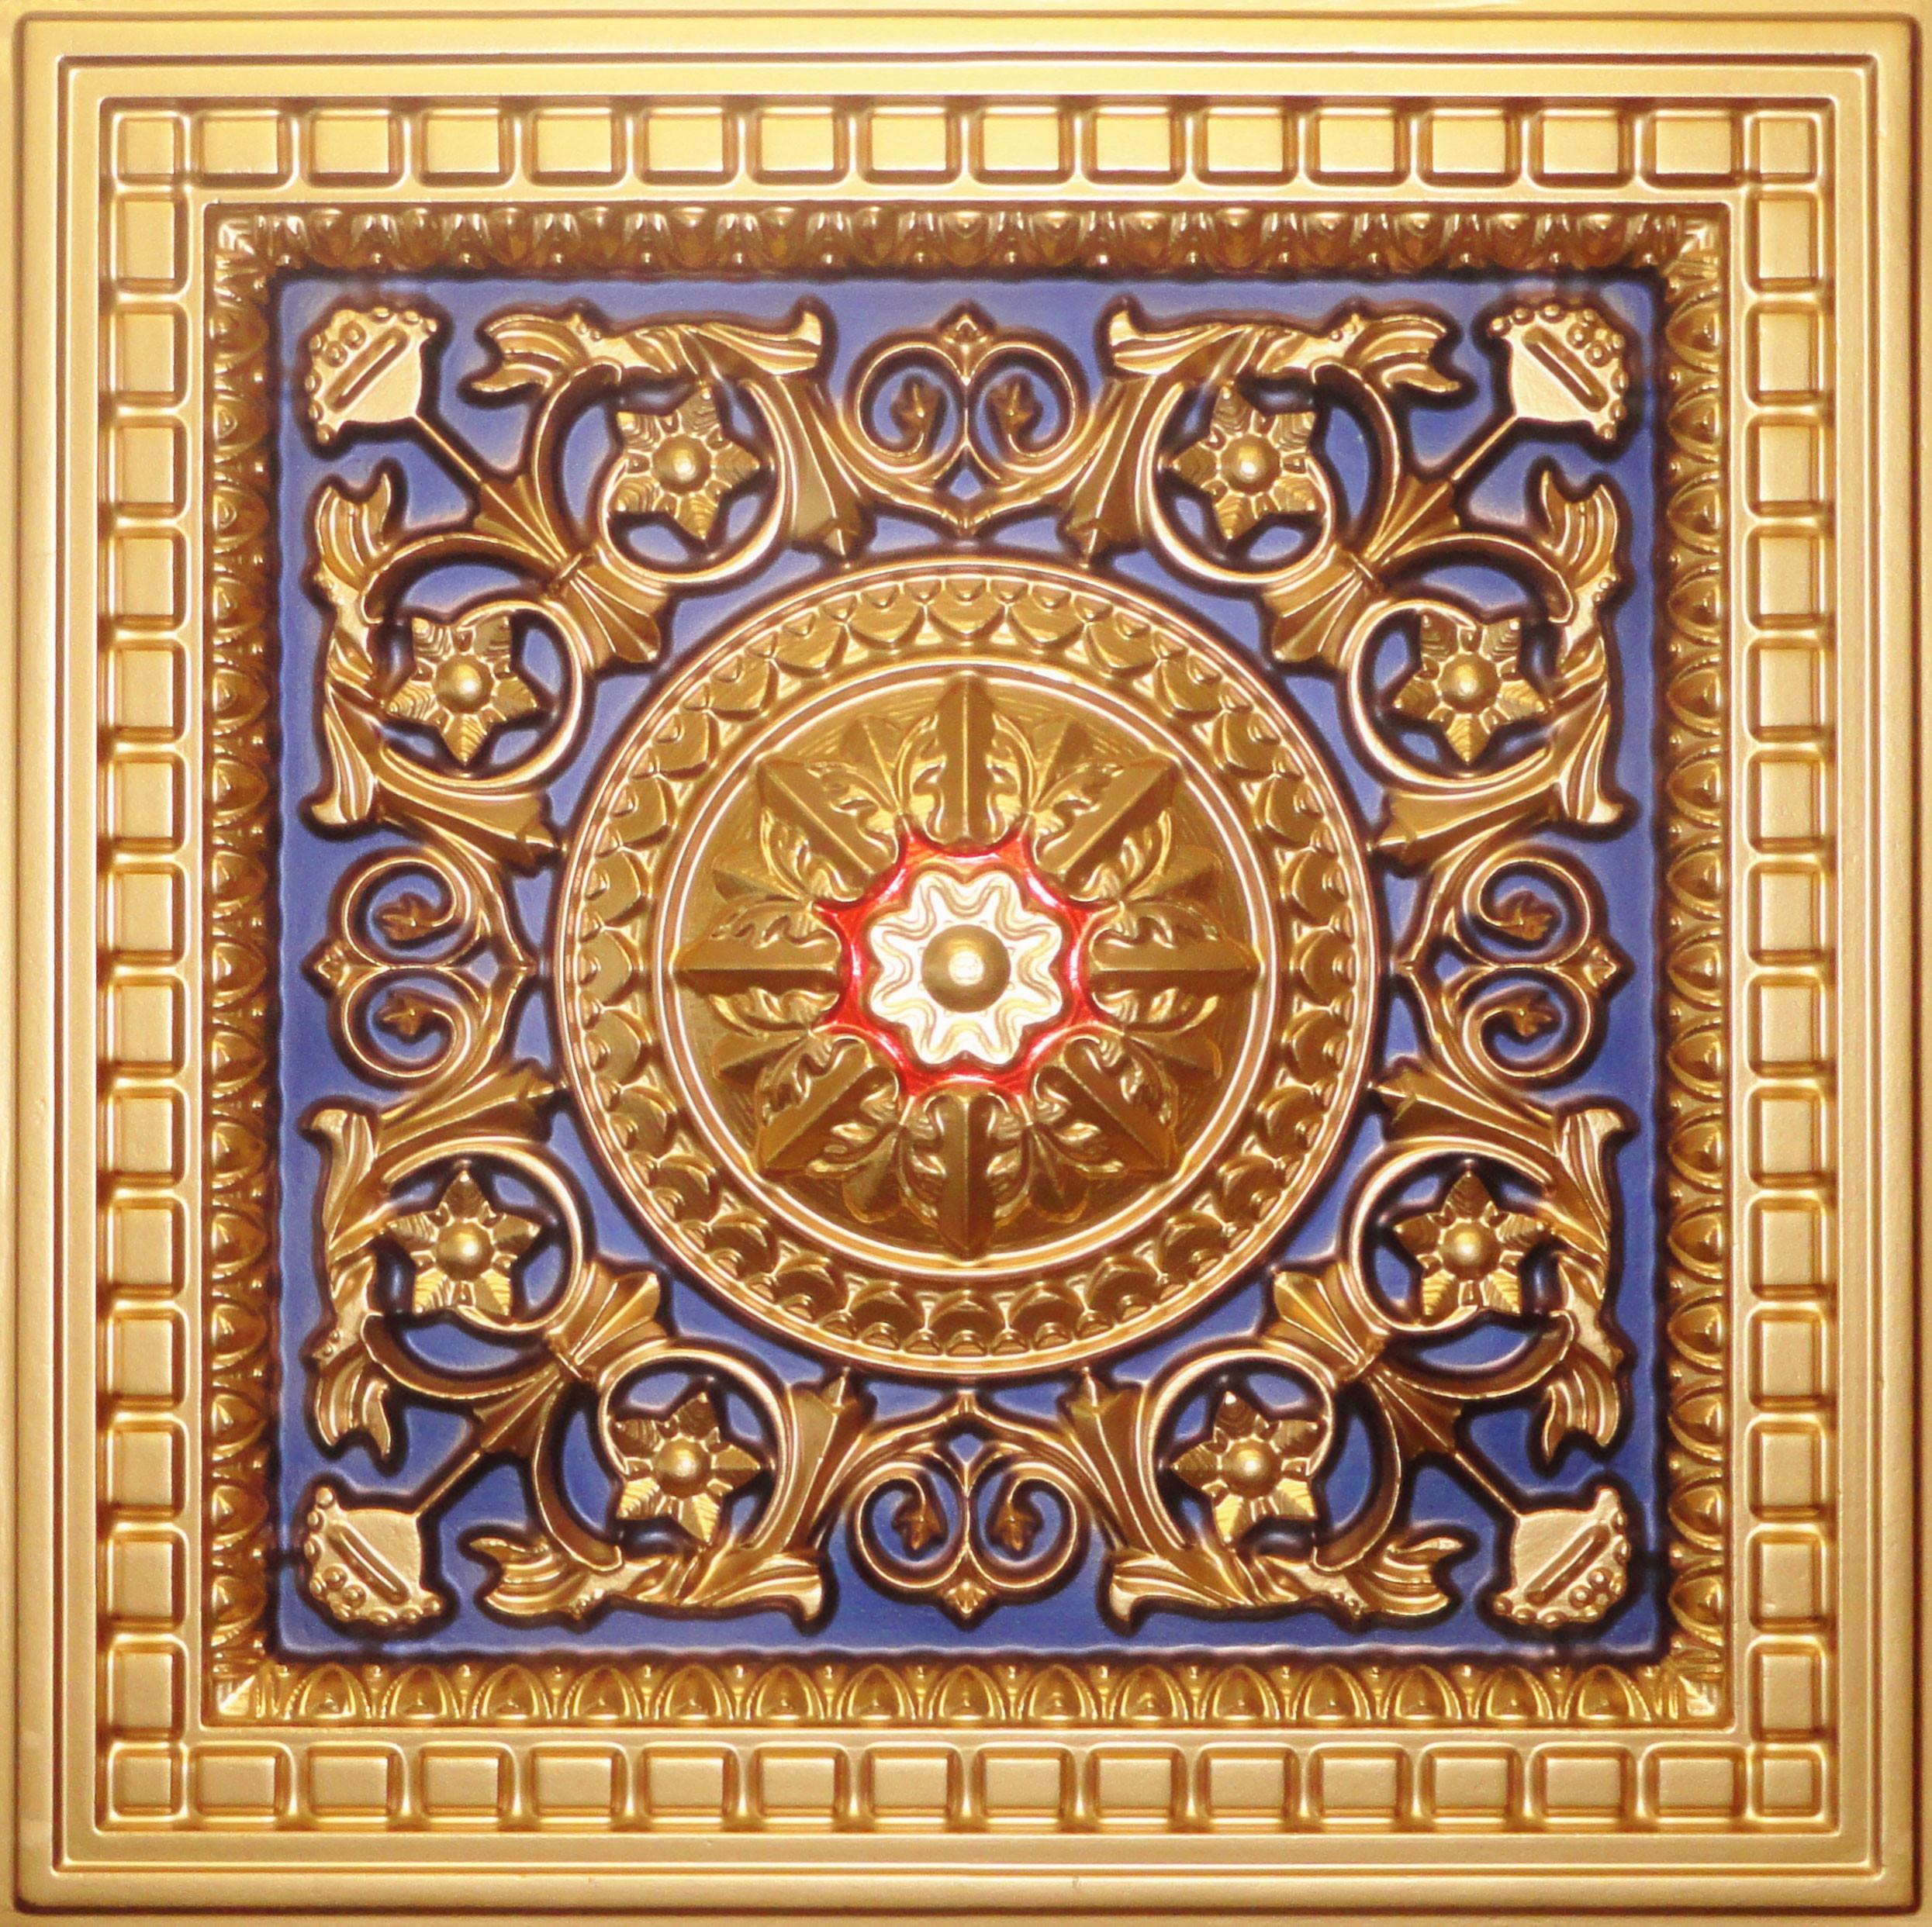 D215 pvc ceiling tile 24x24 drop in gold navy blue red faux d215 pvc ceiling tile 24x24 drop in gold navy blue red faux tin pvc ceiling tiles 2x2 dailygadgetfo Images